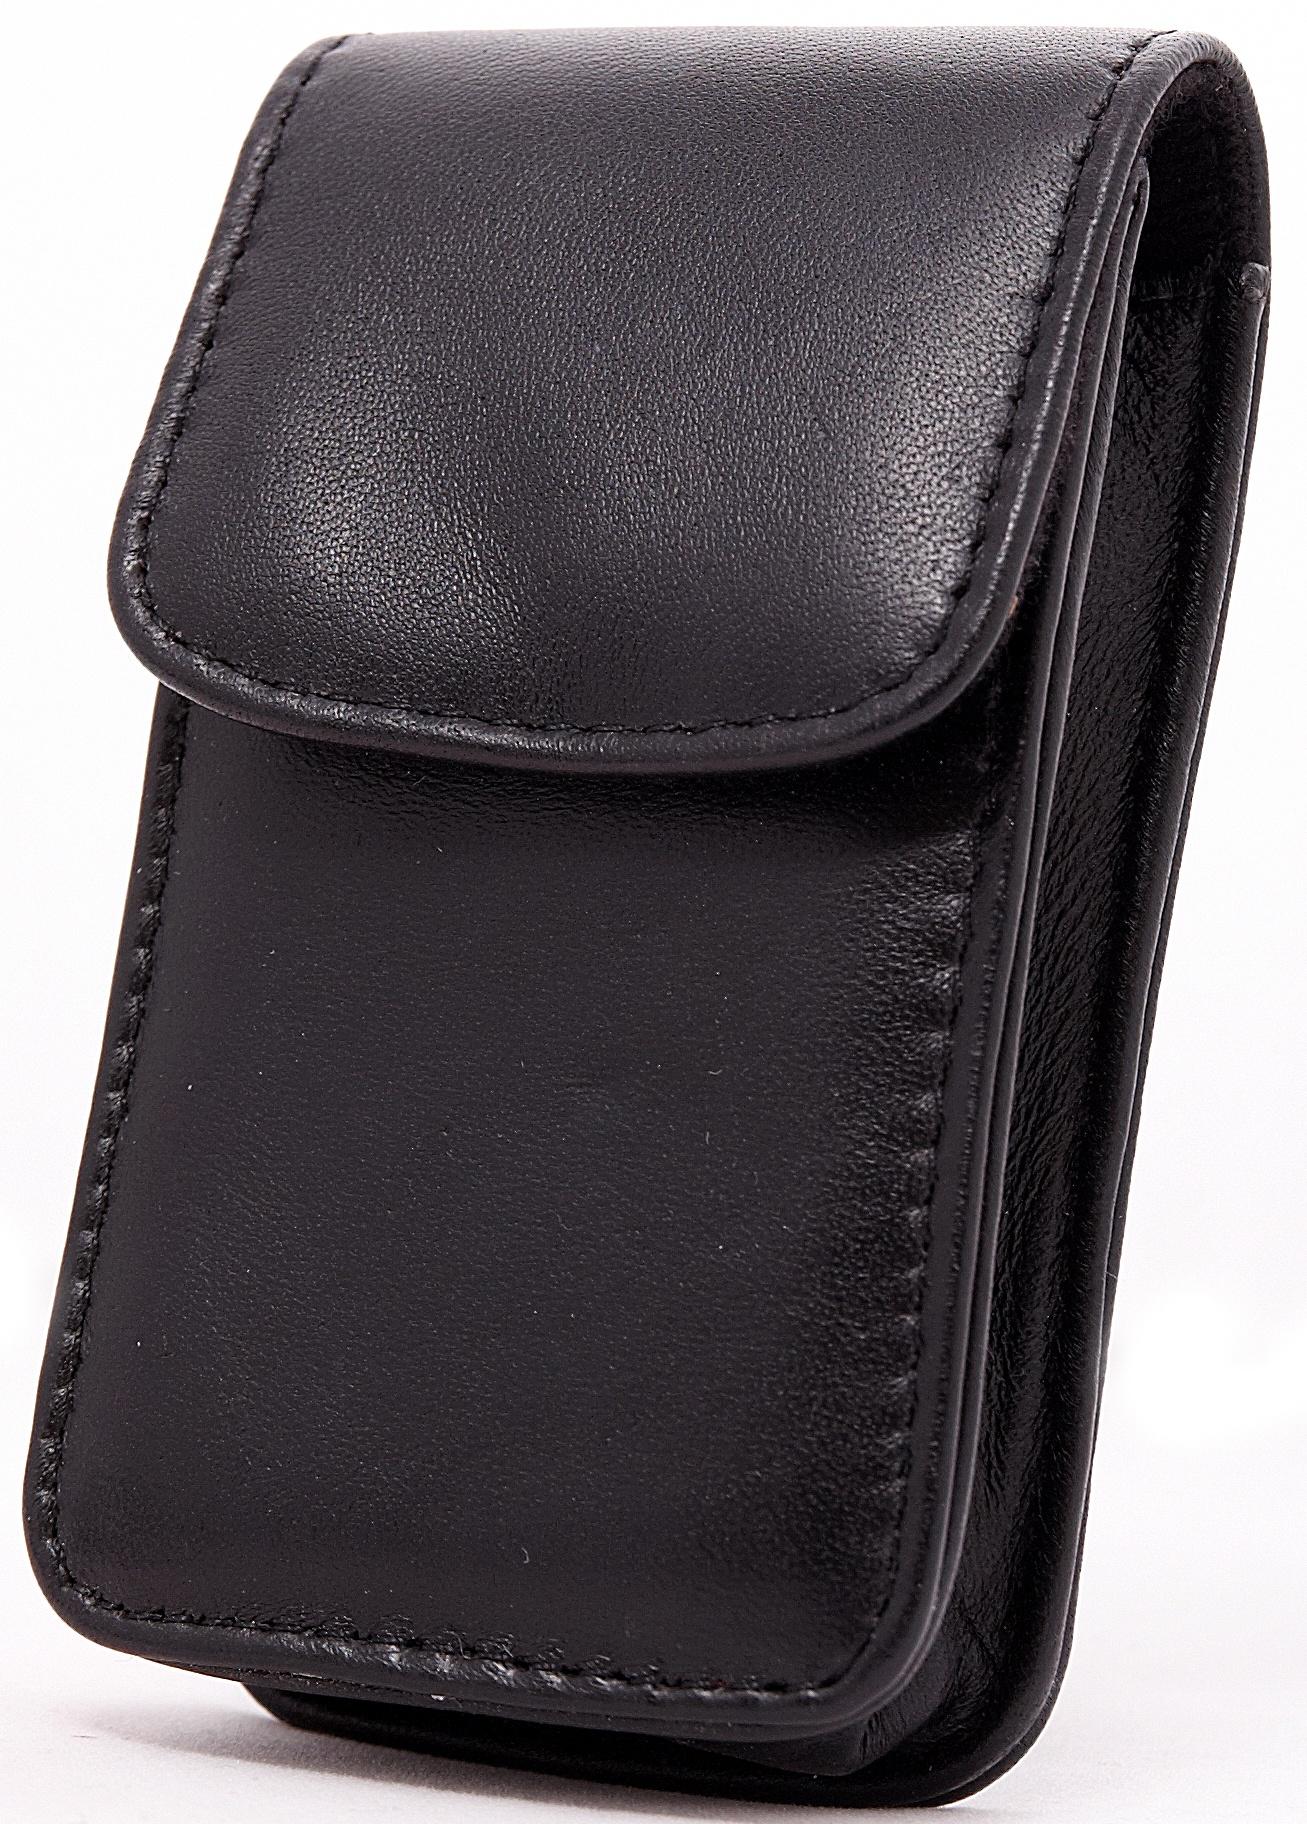 Чехол Roxwill F30, цвет черный roxwill k10 grey чехол для фото и видеокамер